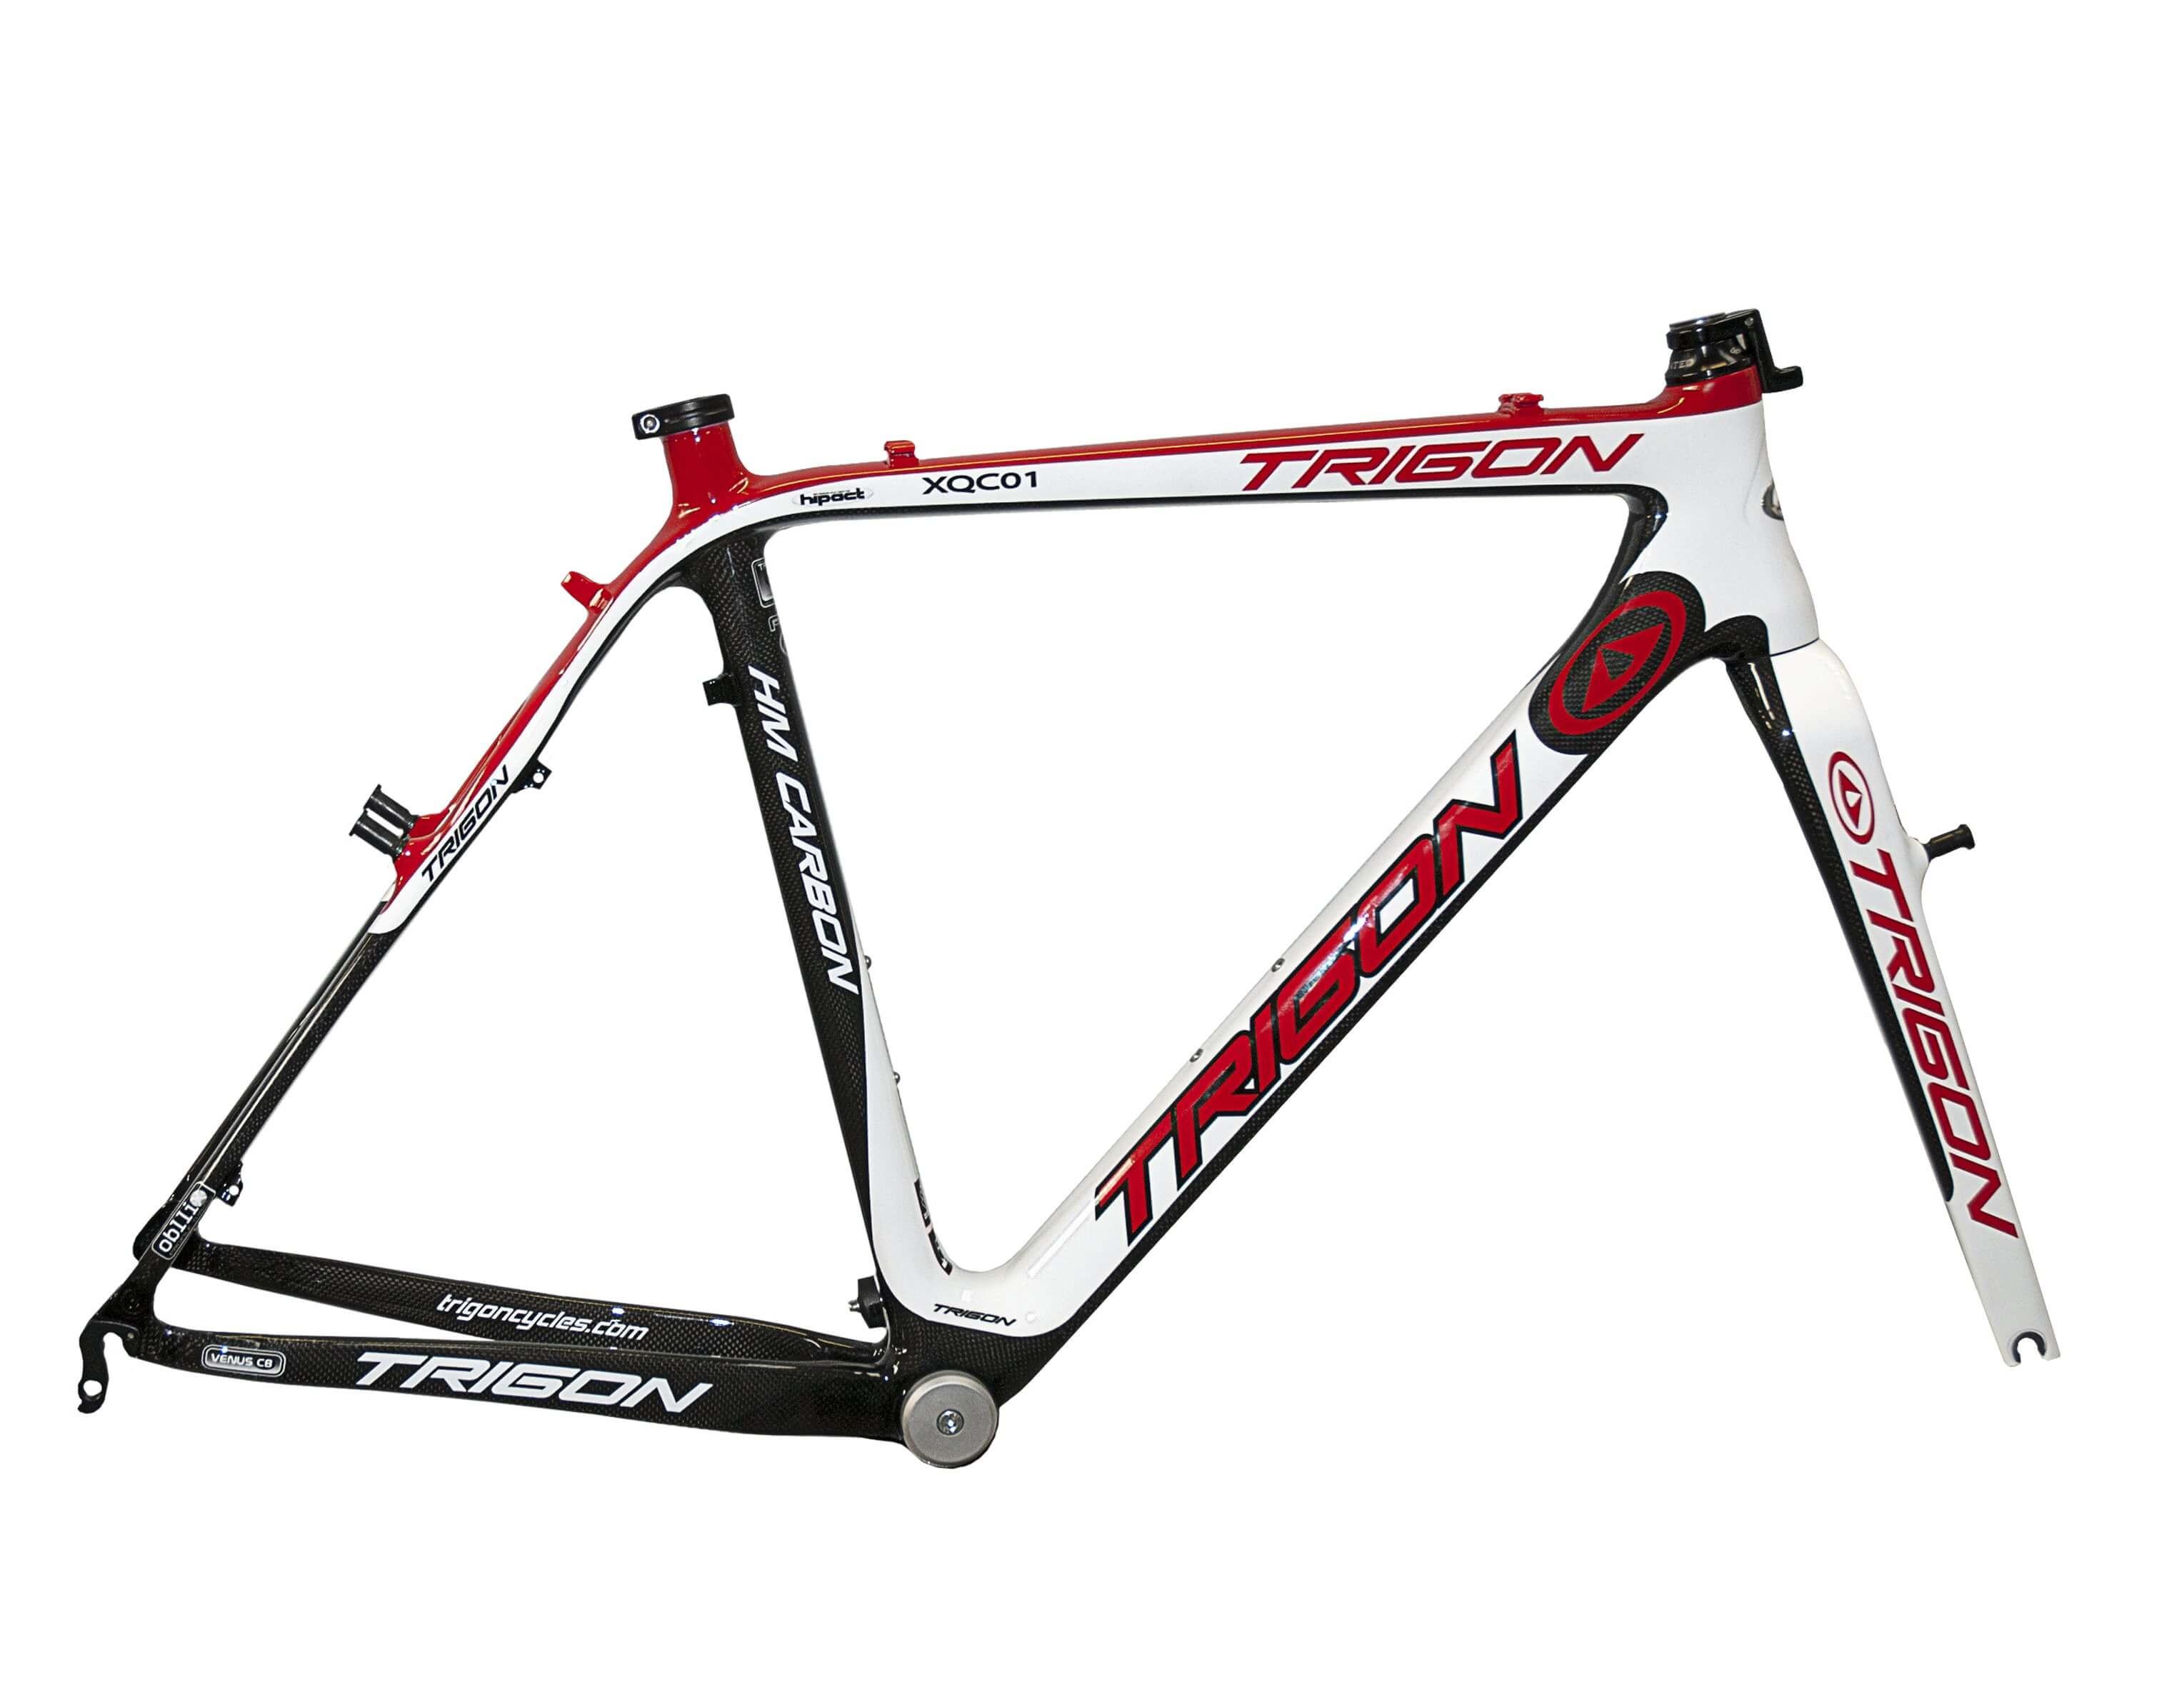 Trigon Xqc01 BB30 Cyclocross Bike Frame Pod